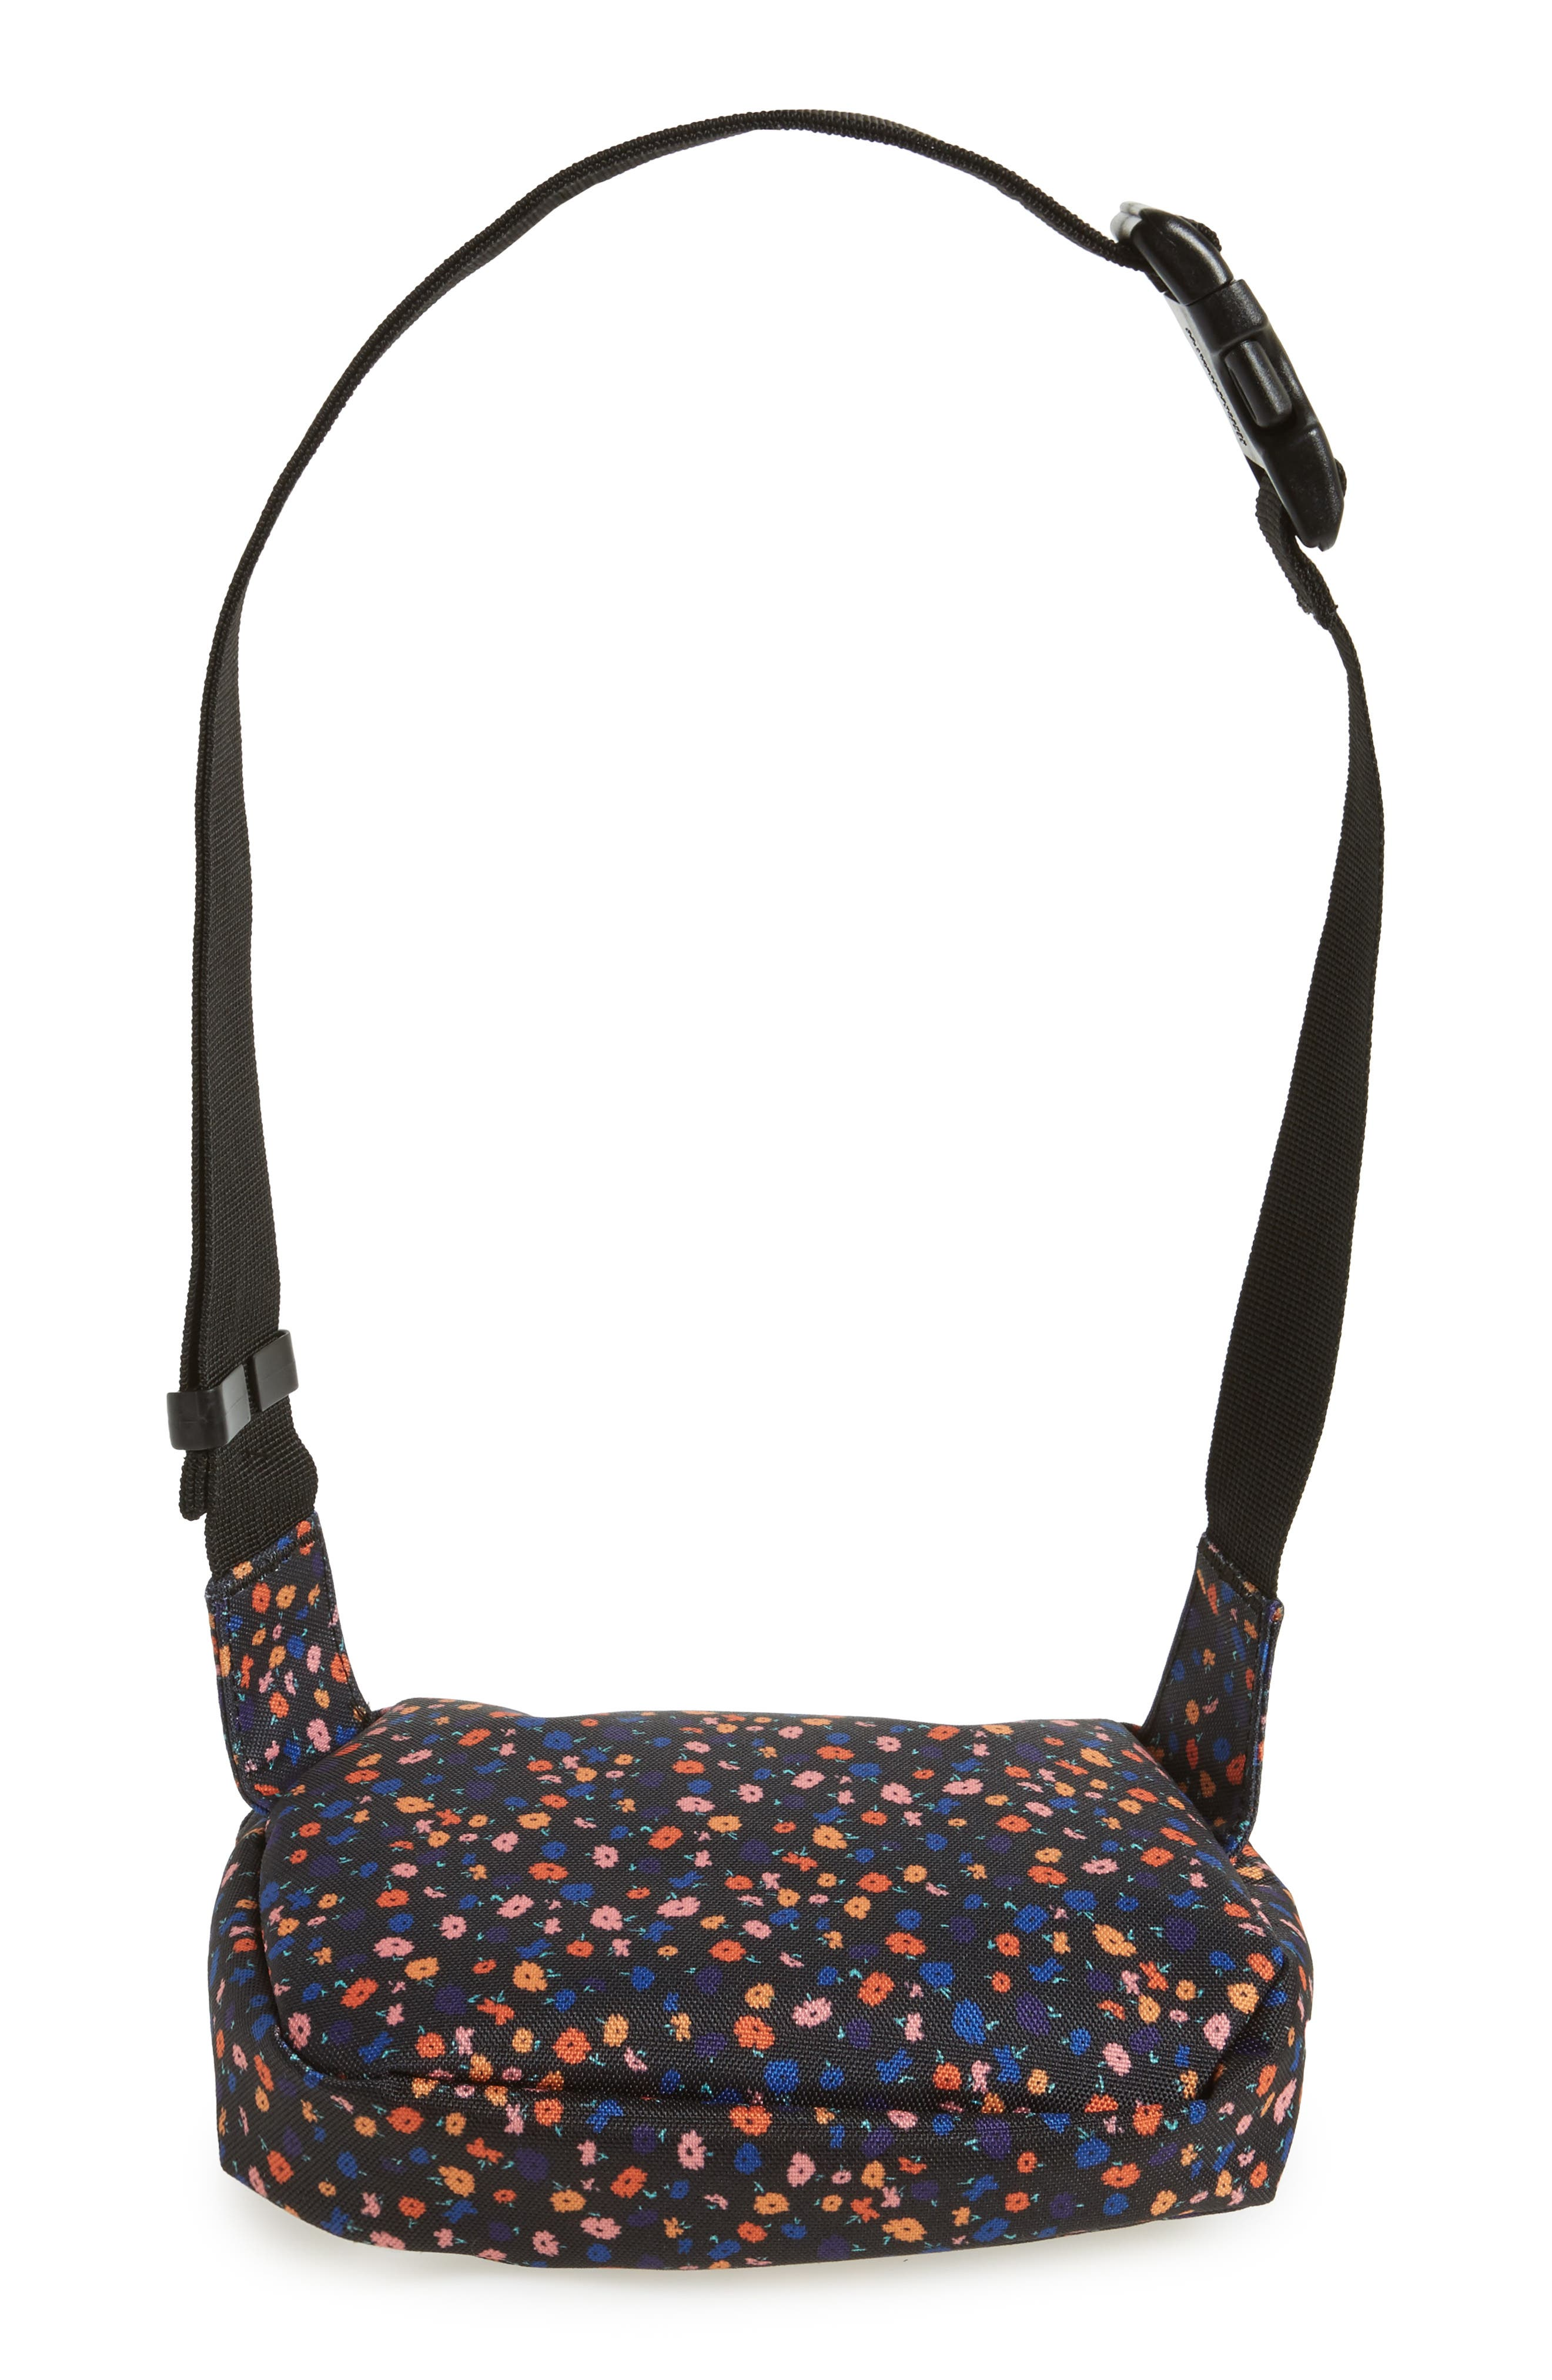 Fifteen Belt Bag,                             Alternate thumbnail 6, color,                             BLACK MINI FLORAL